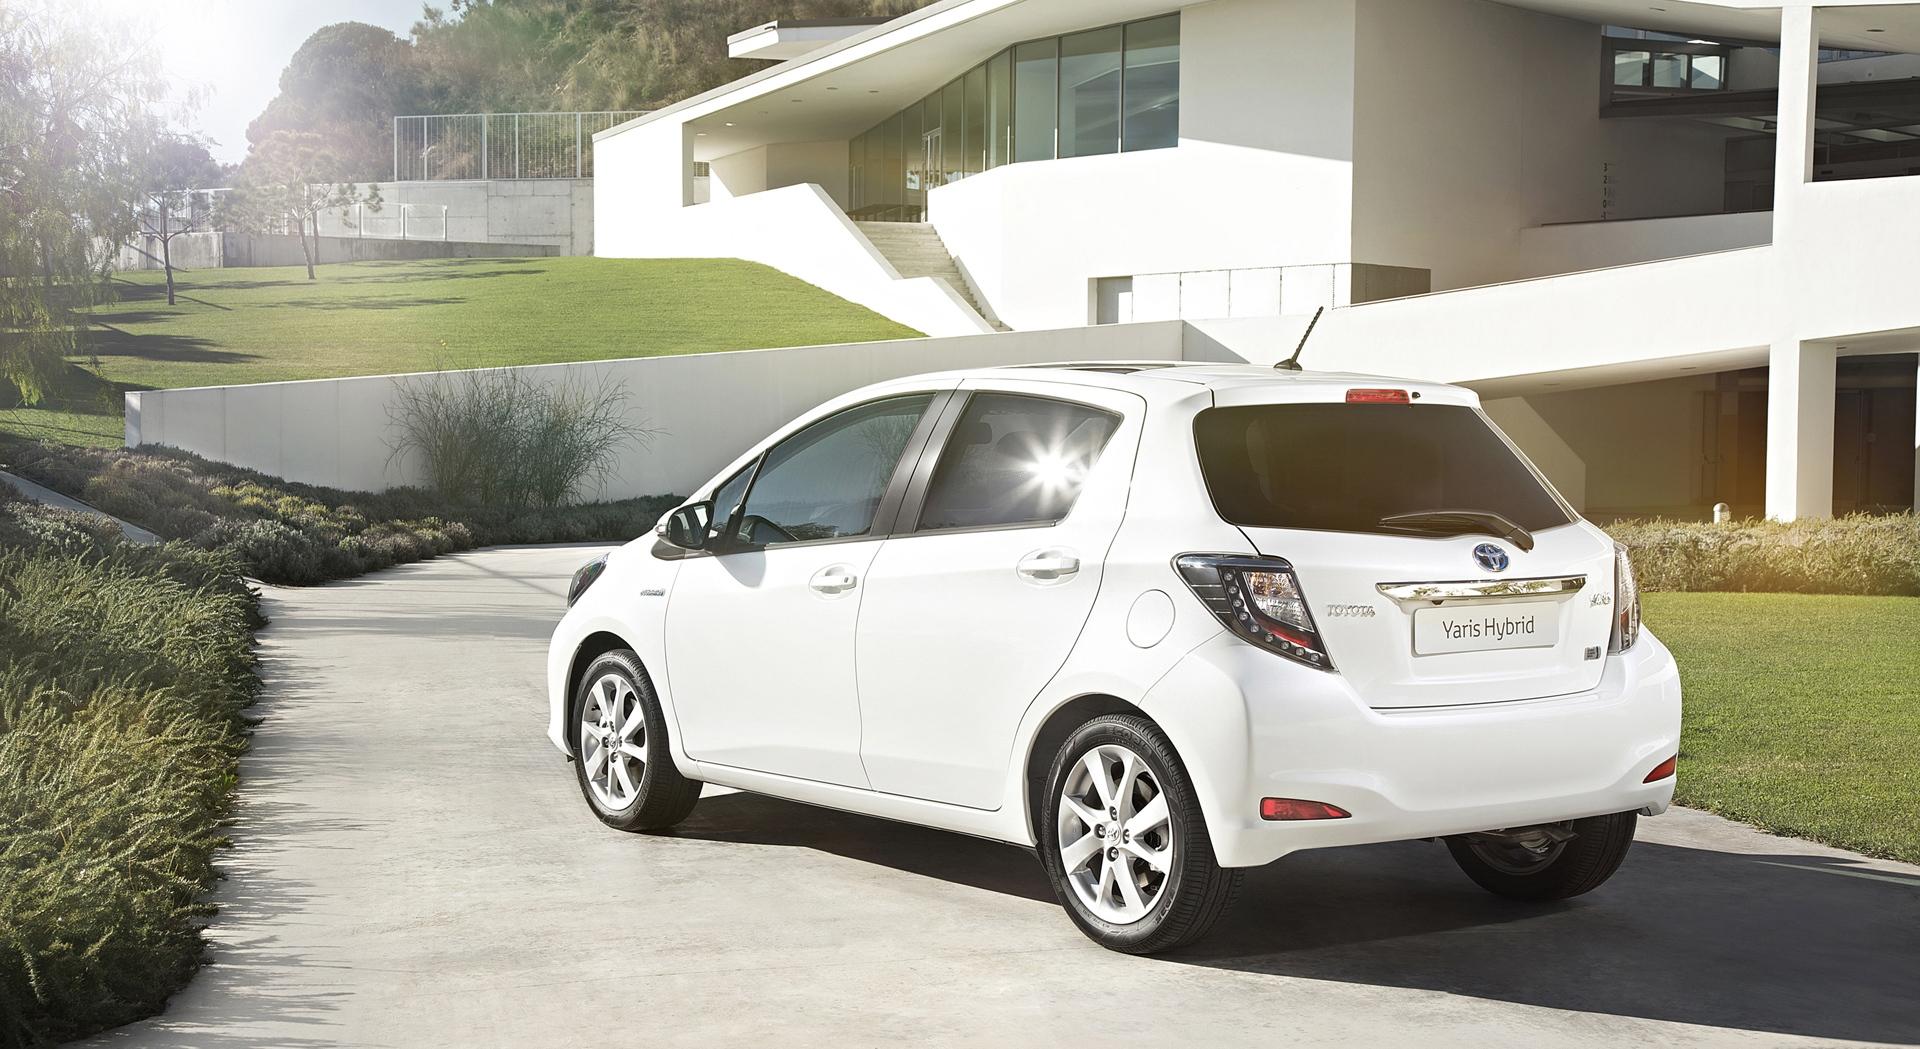 toyota yaris trd white grand new avanza modif velg hybrid rear hd desktop wallpapers 4k